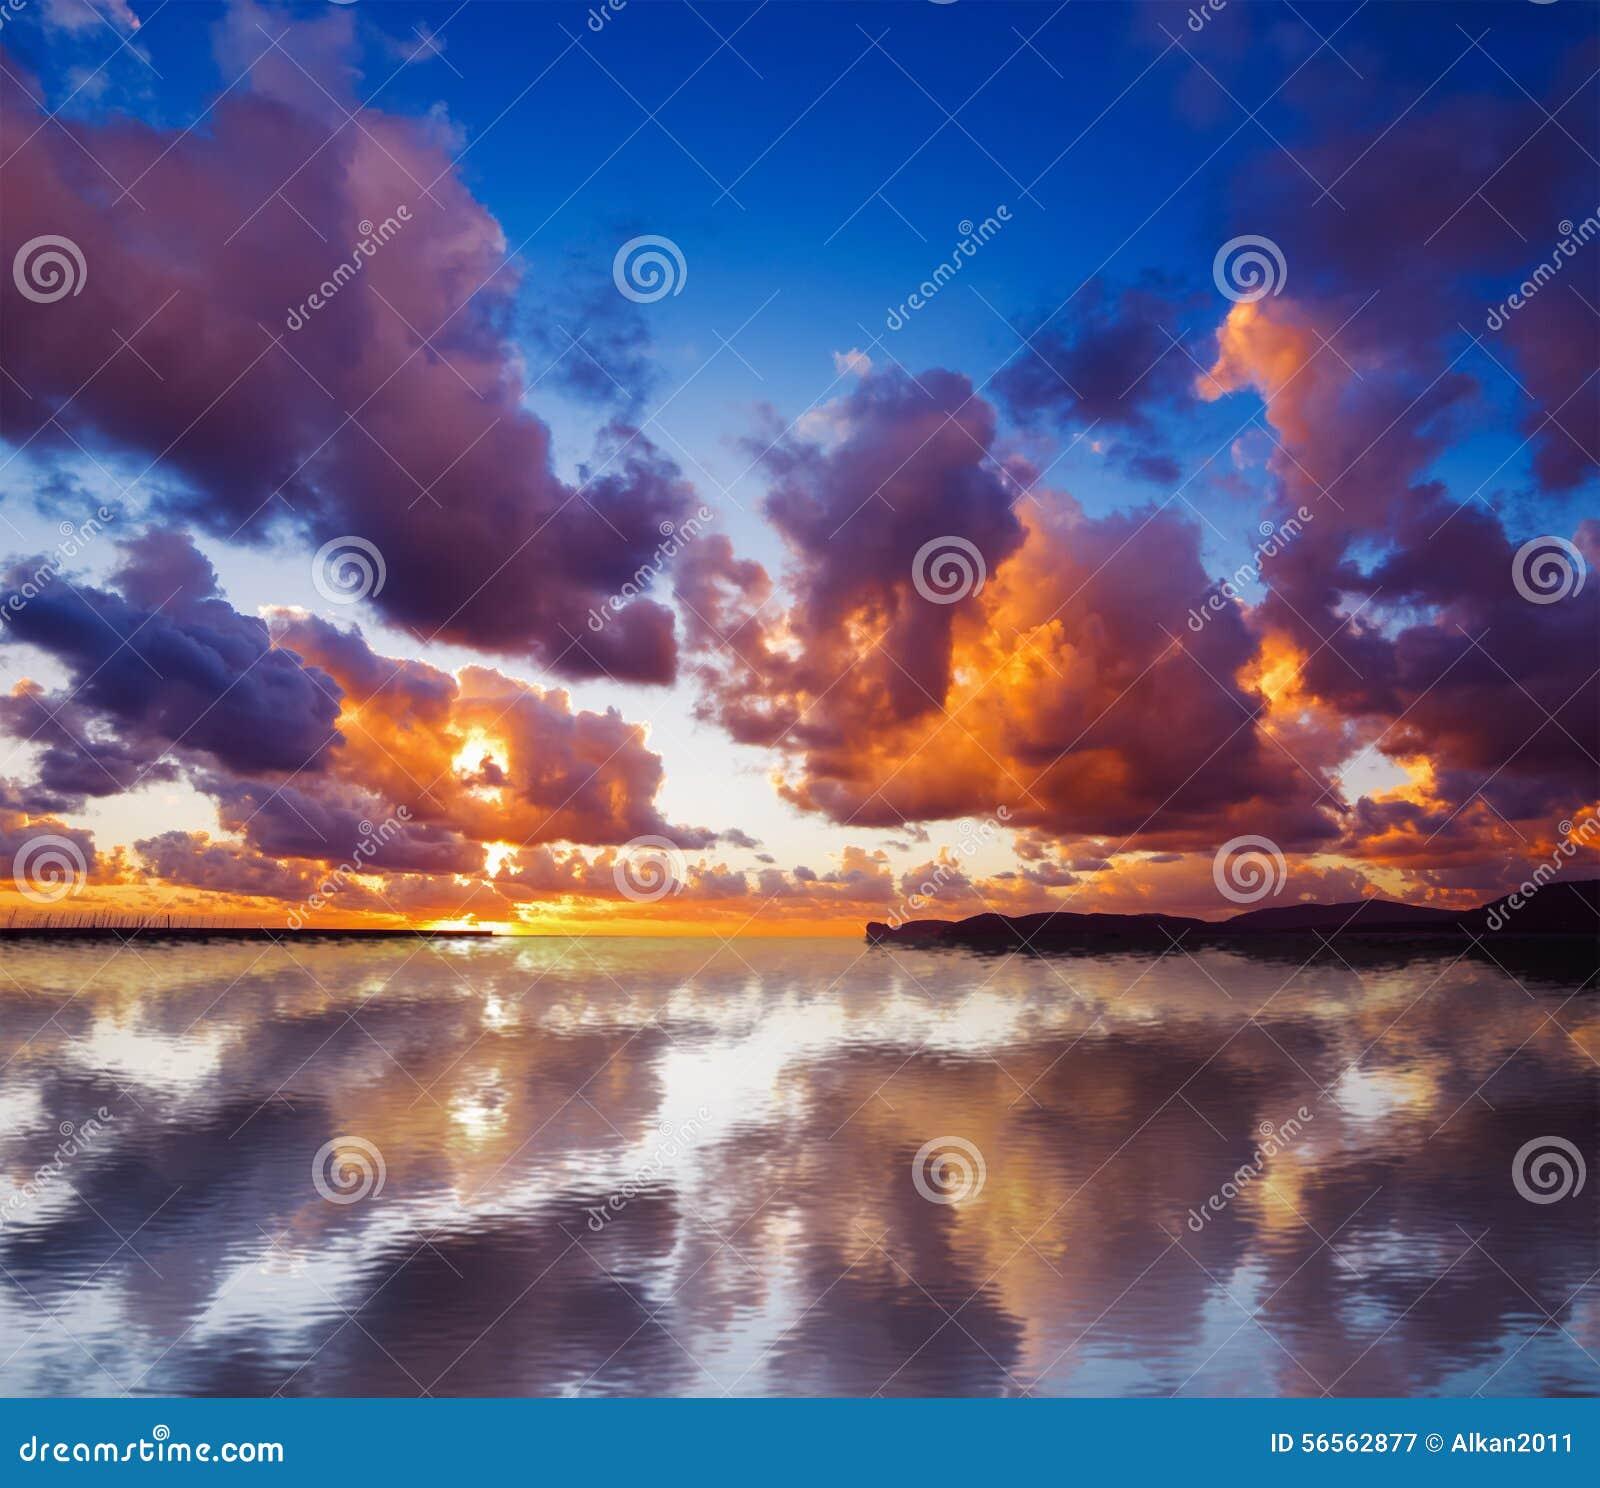 Download Ουρανός που απεικονίζεται στο νερό στο ηλιοβασίλεμα Στοκ Εικόνα - εικόνα από έξυπνο, φθινοπώρου: 56562877